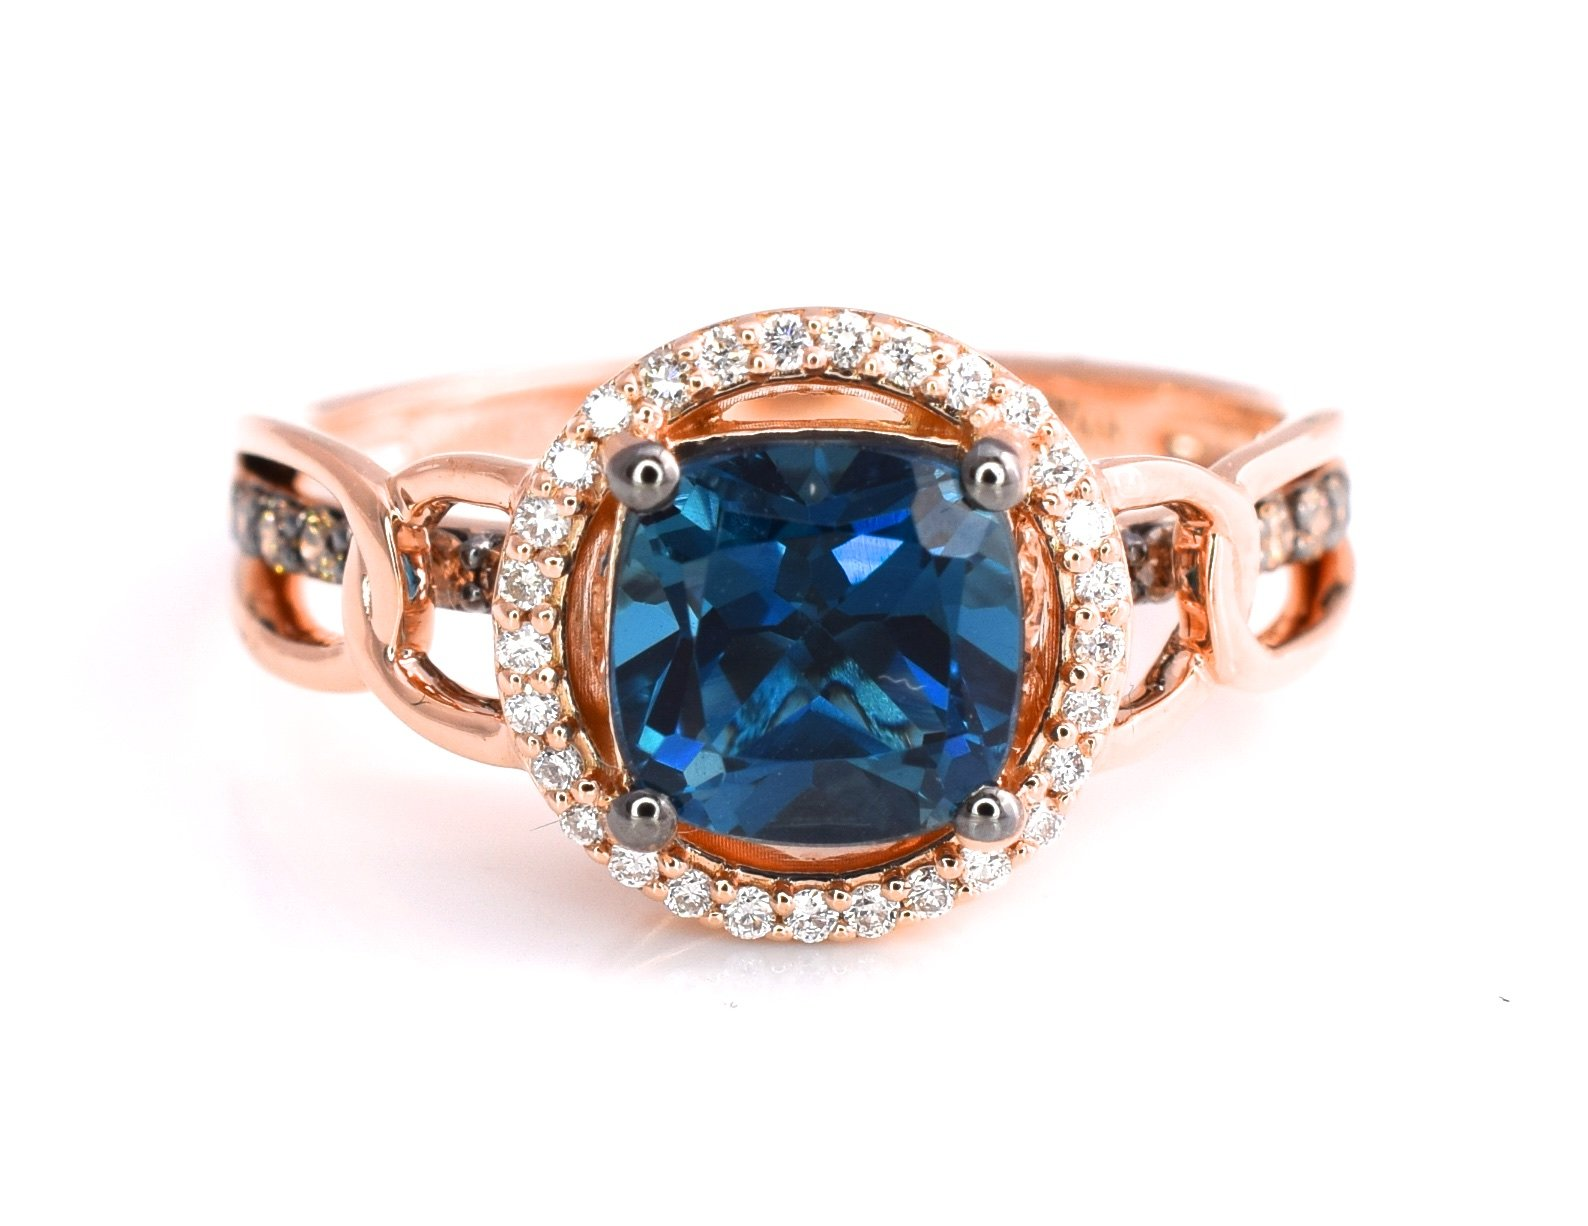 LeVian Deep Sea Blue Topaz Ring Chocolate and Vanilla Diamonds 1.74 cttw 14K Rose Gold Size 7